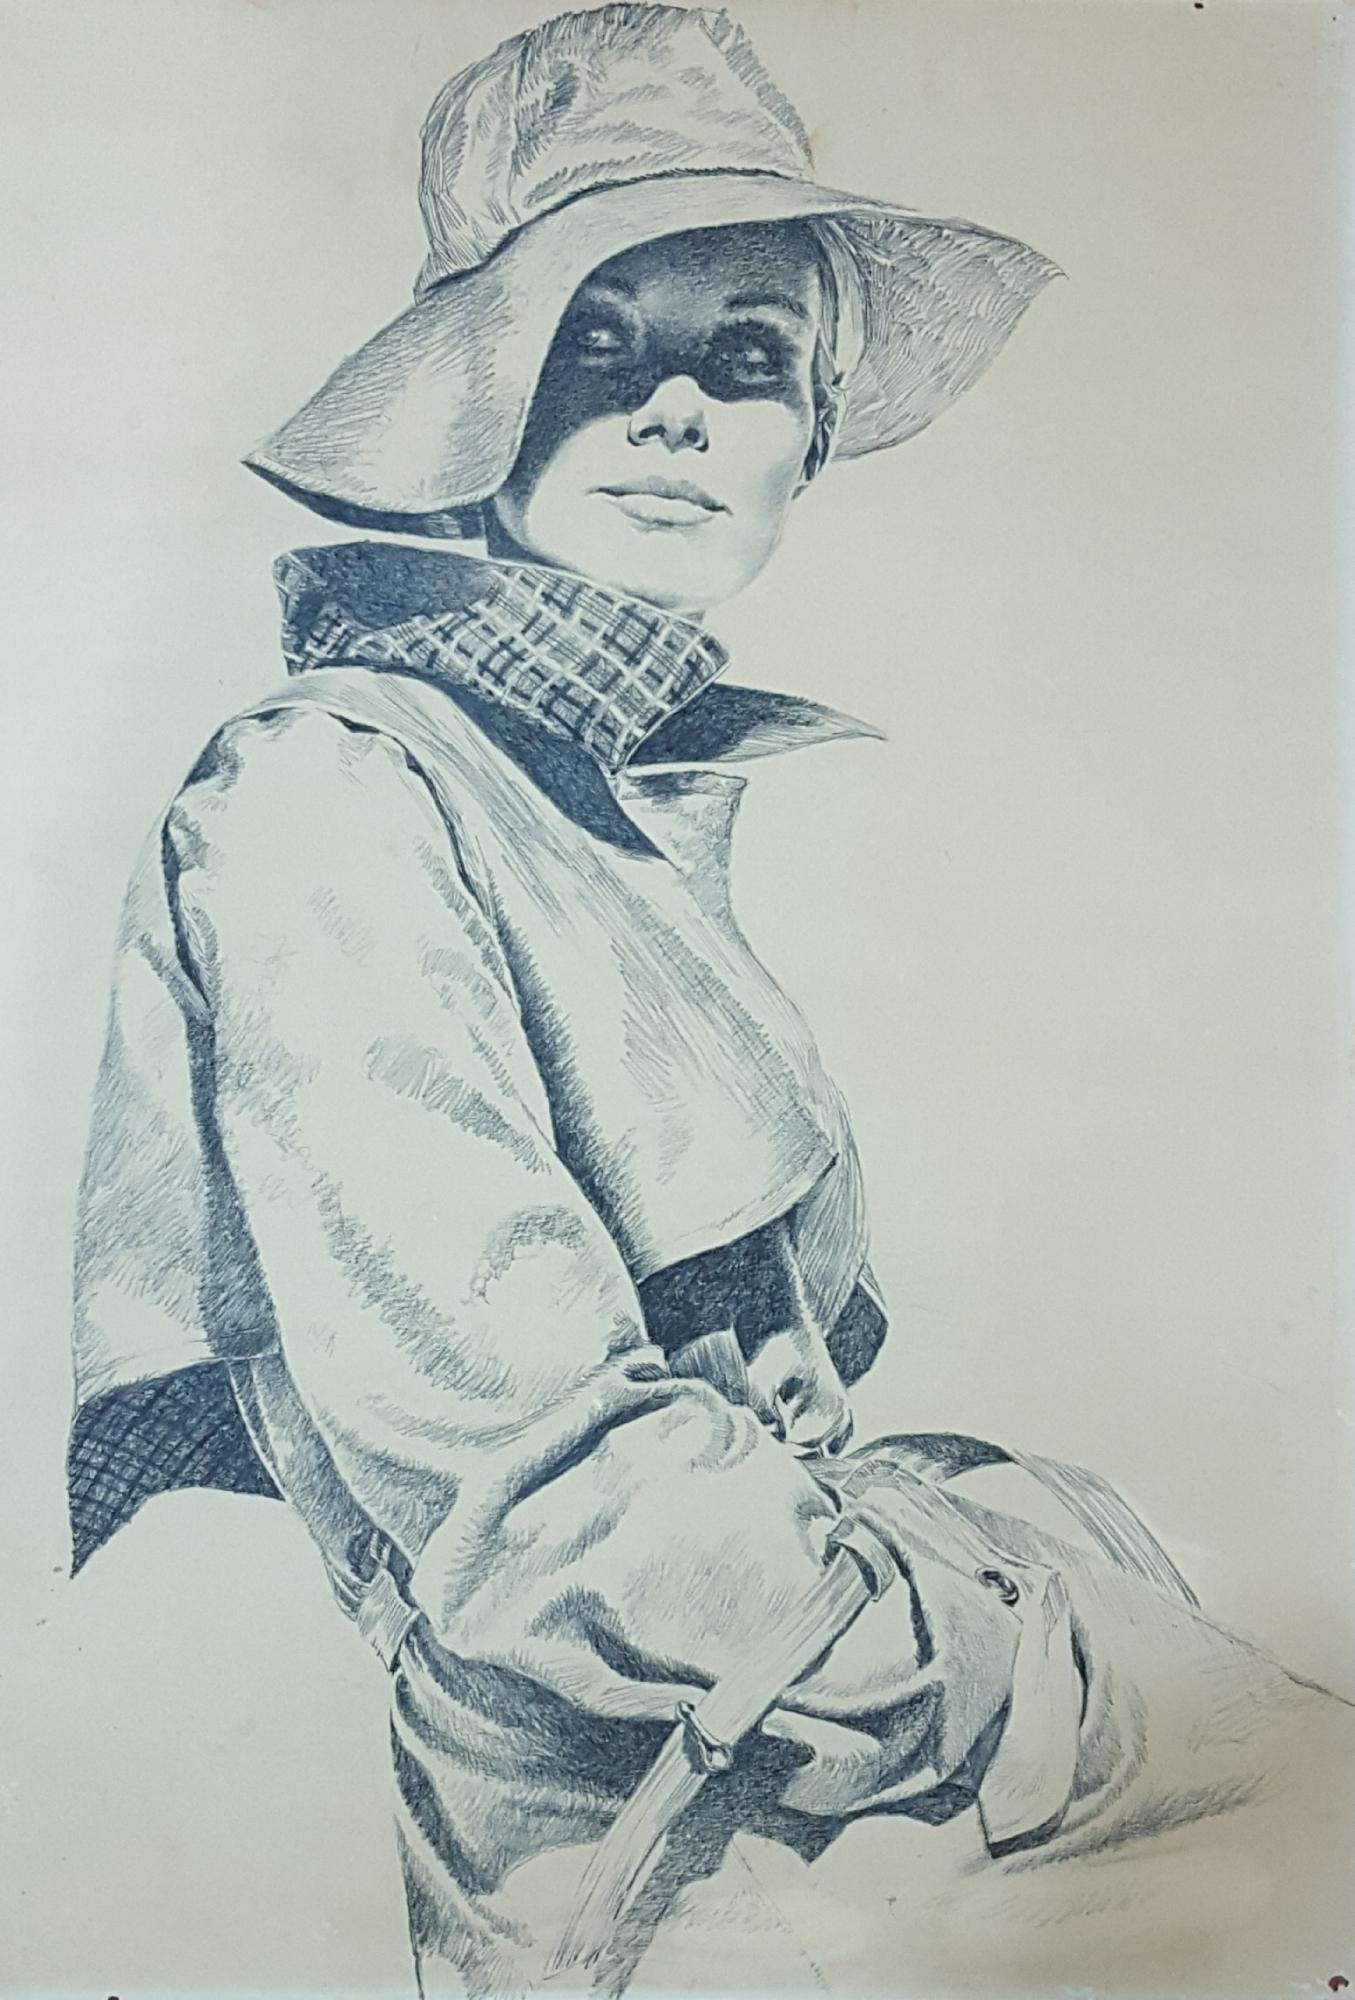 7ab1035c0 Pepe Gonzalez - Mujer con gabardina, in Diego Alatriste y Tenorio's ...